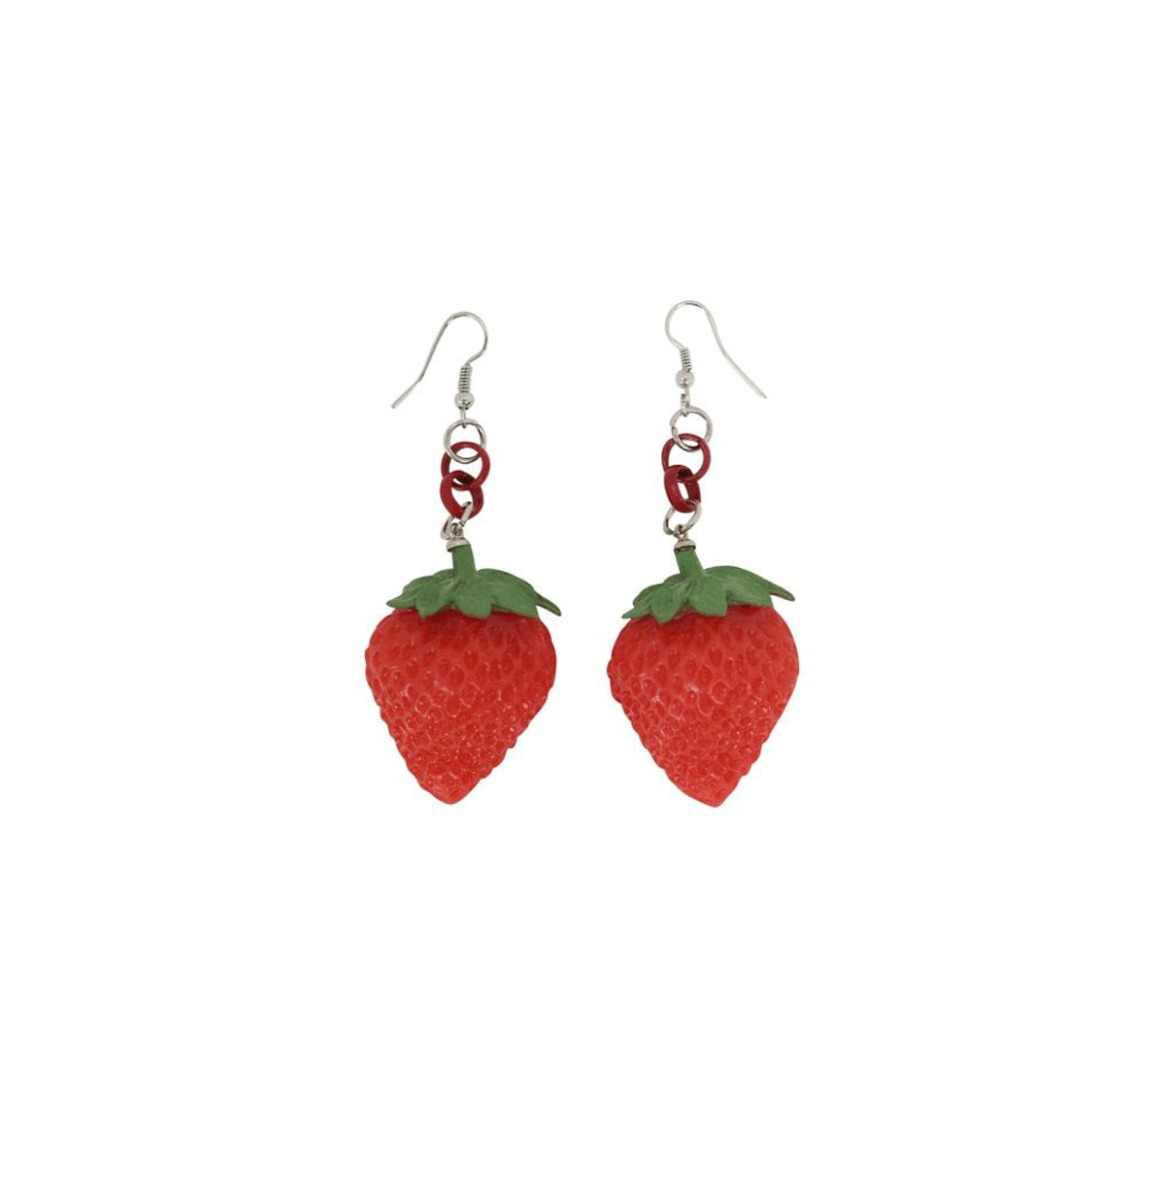 Lily Strawberry Oorbellen